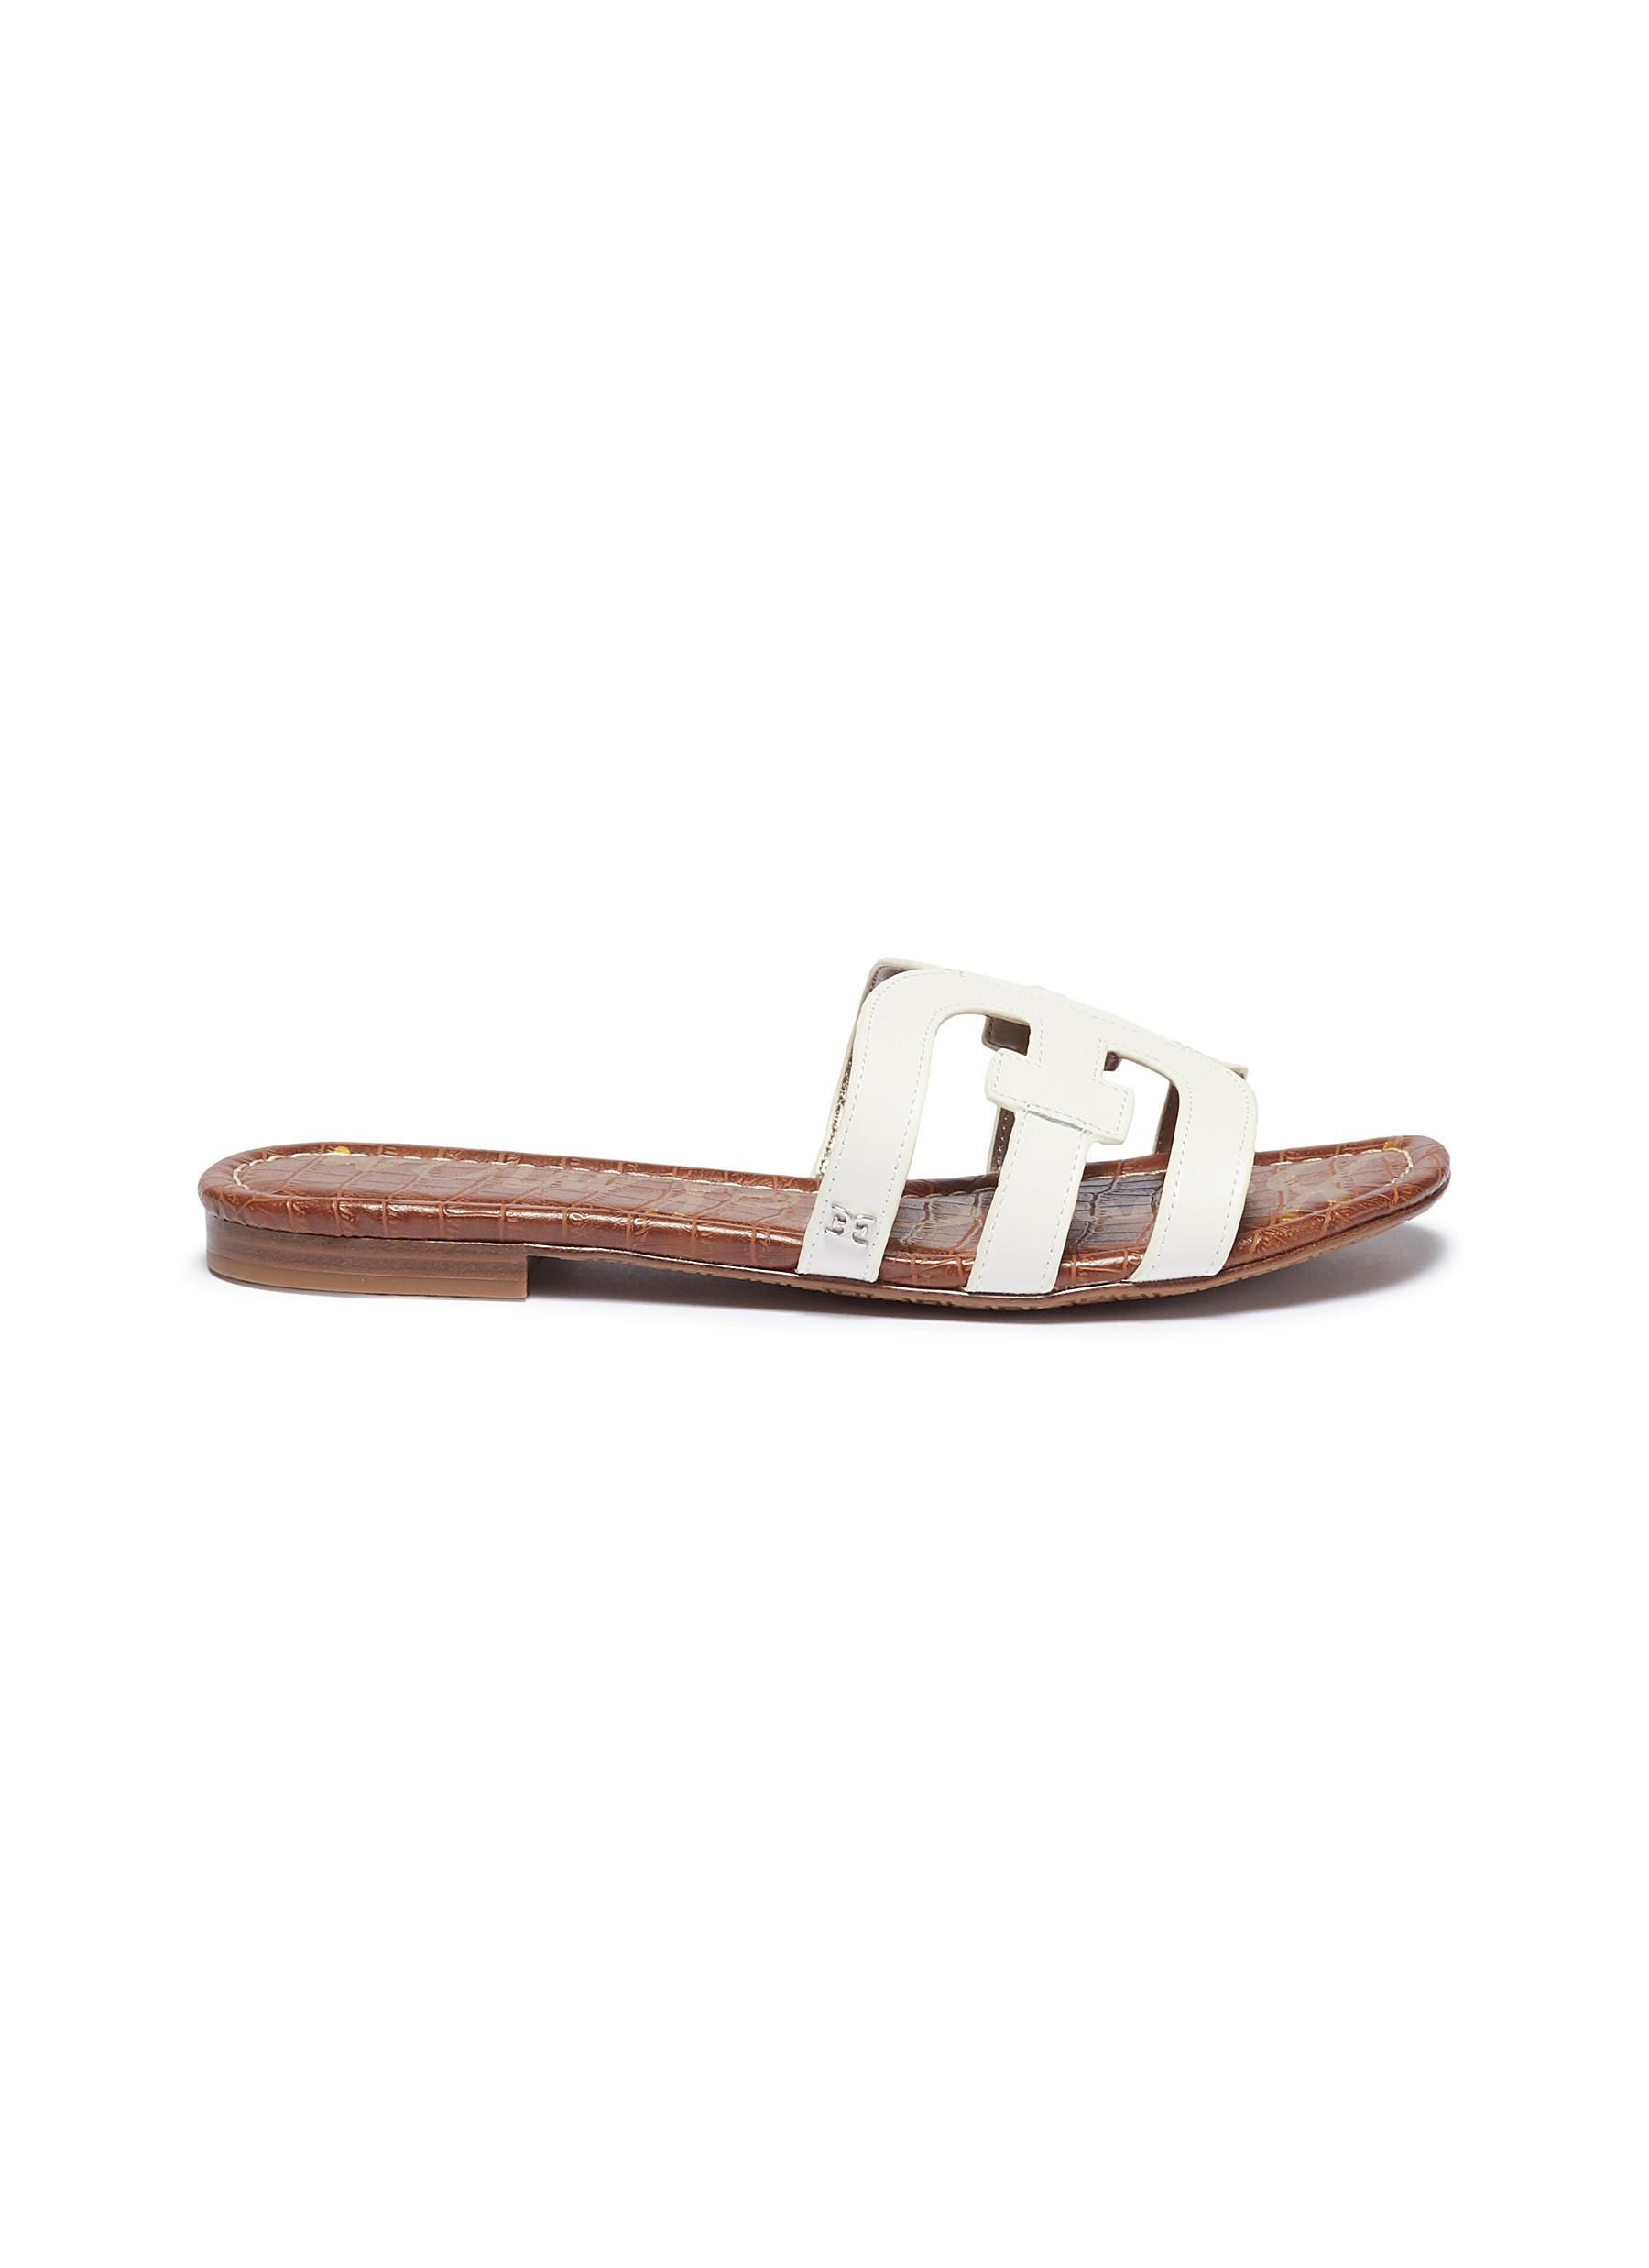 2300a26f9 Sam Edelman  bay  Leather Slide Sandals in White - Lyst